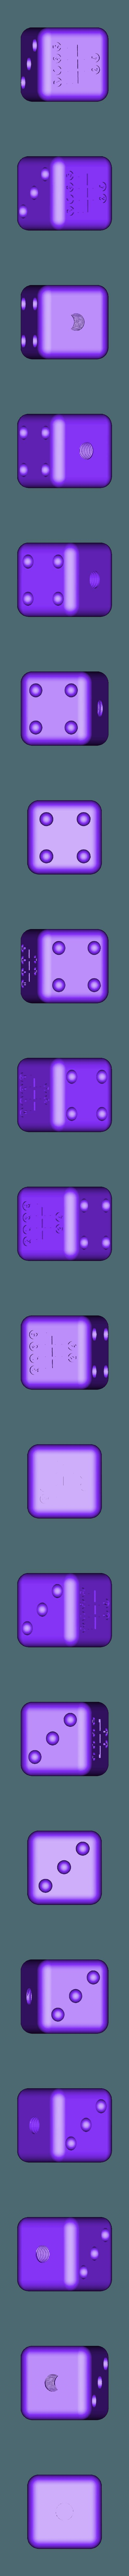 Dice_Shifter.stl Download free OBJ file Dice Shifter - 5 Speed VW • 3D printer design, dice81